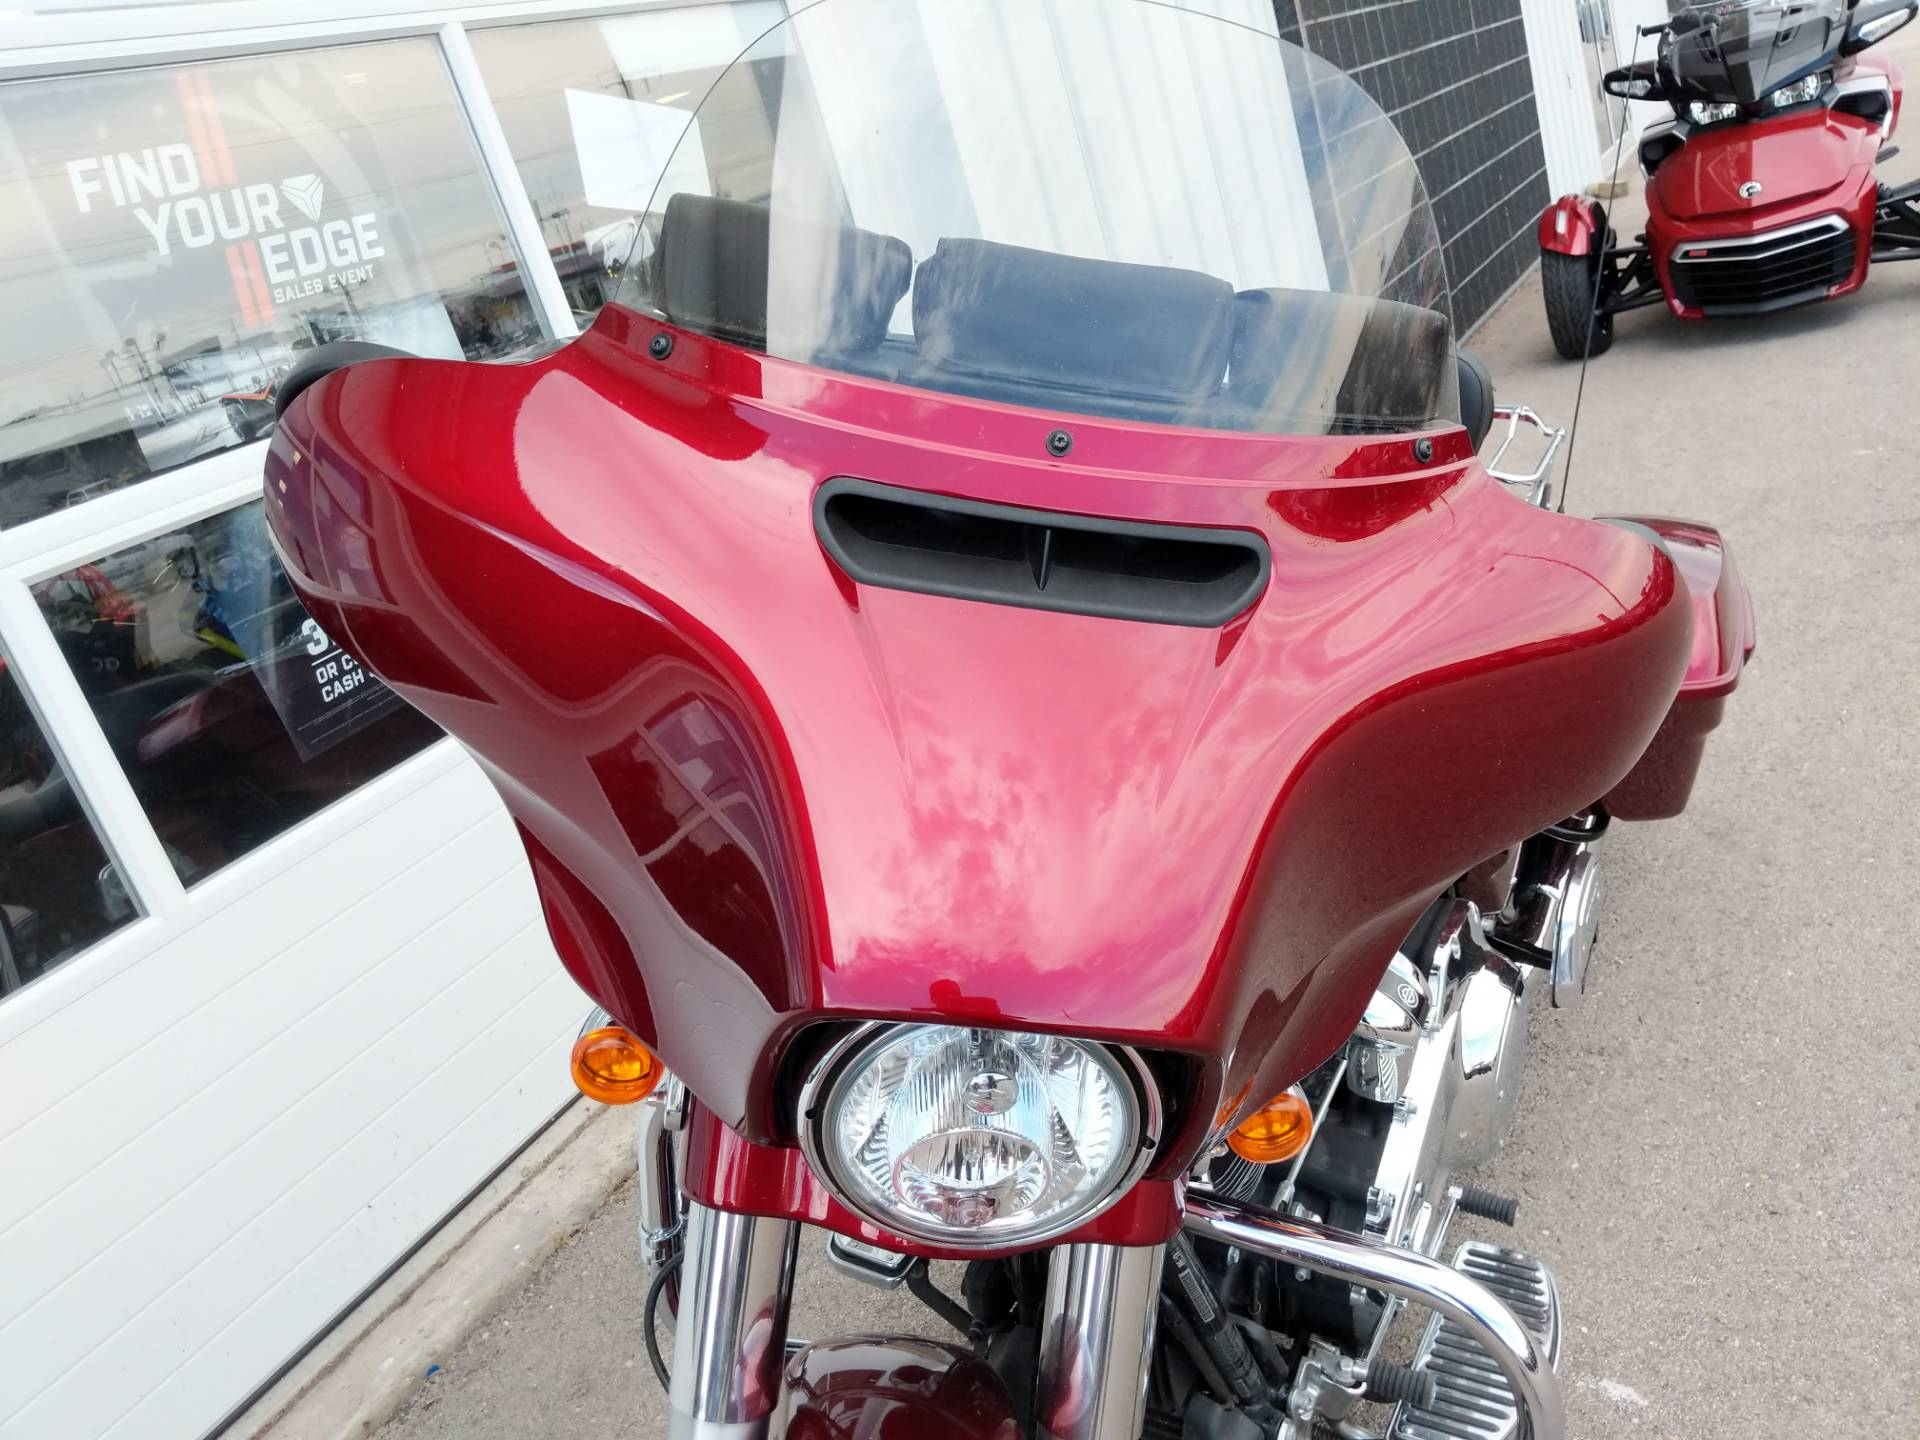 2017 Harley-Davidson Street Glide® Special in Rapid City, South Dakota